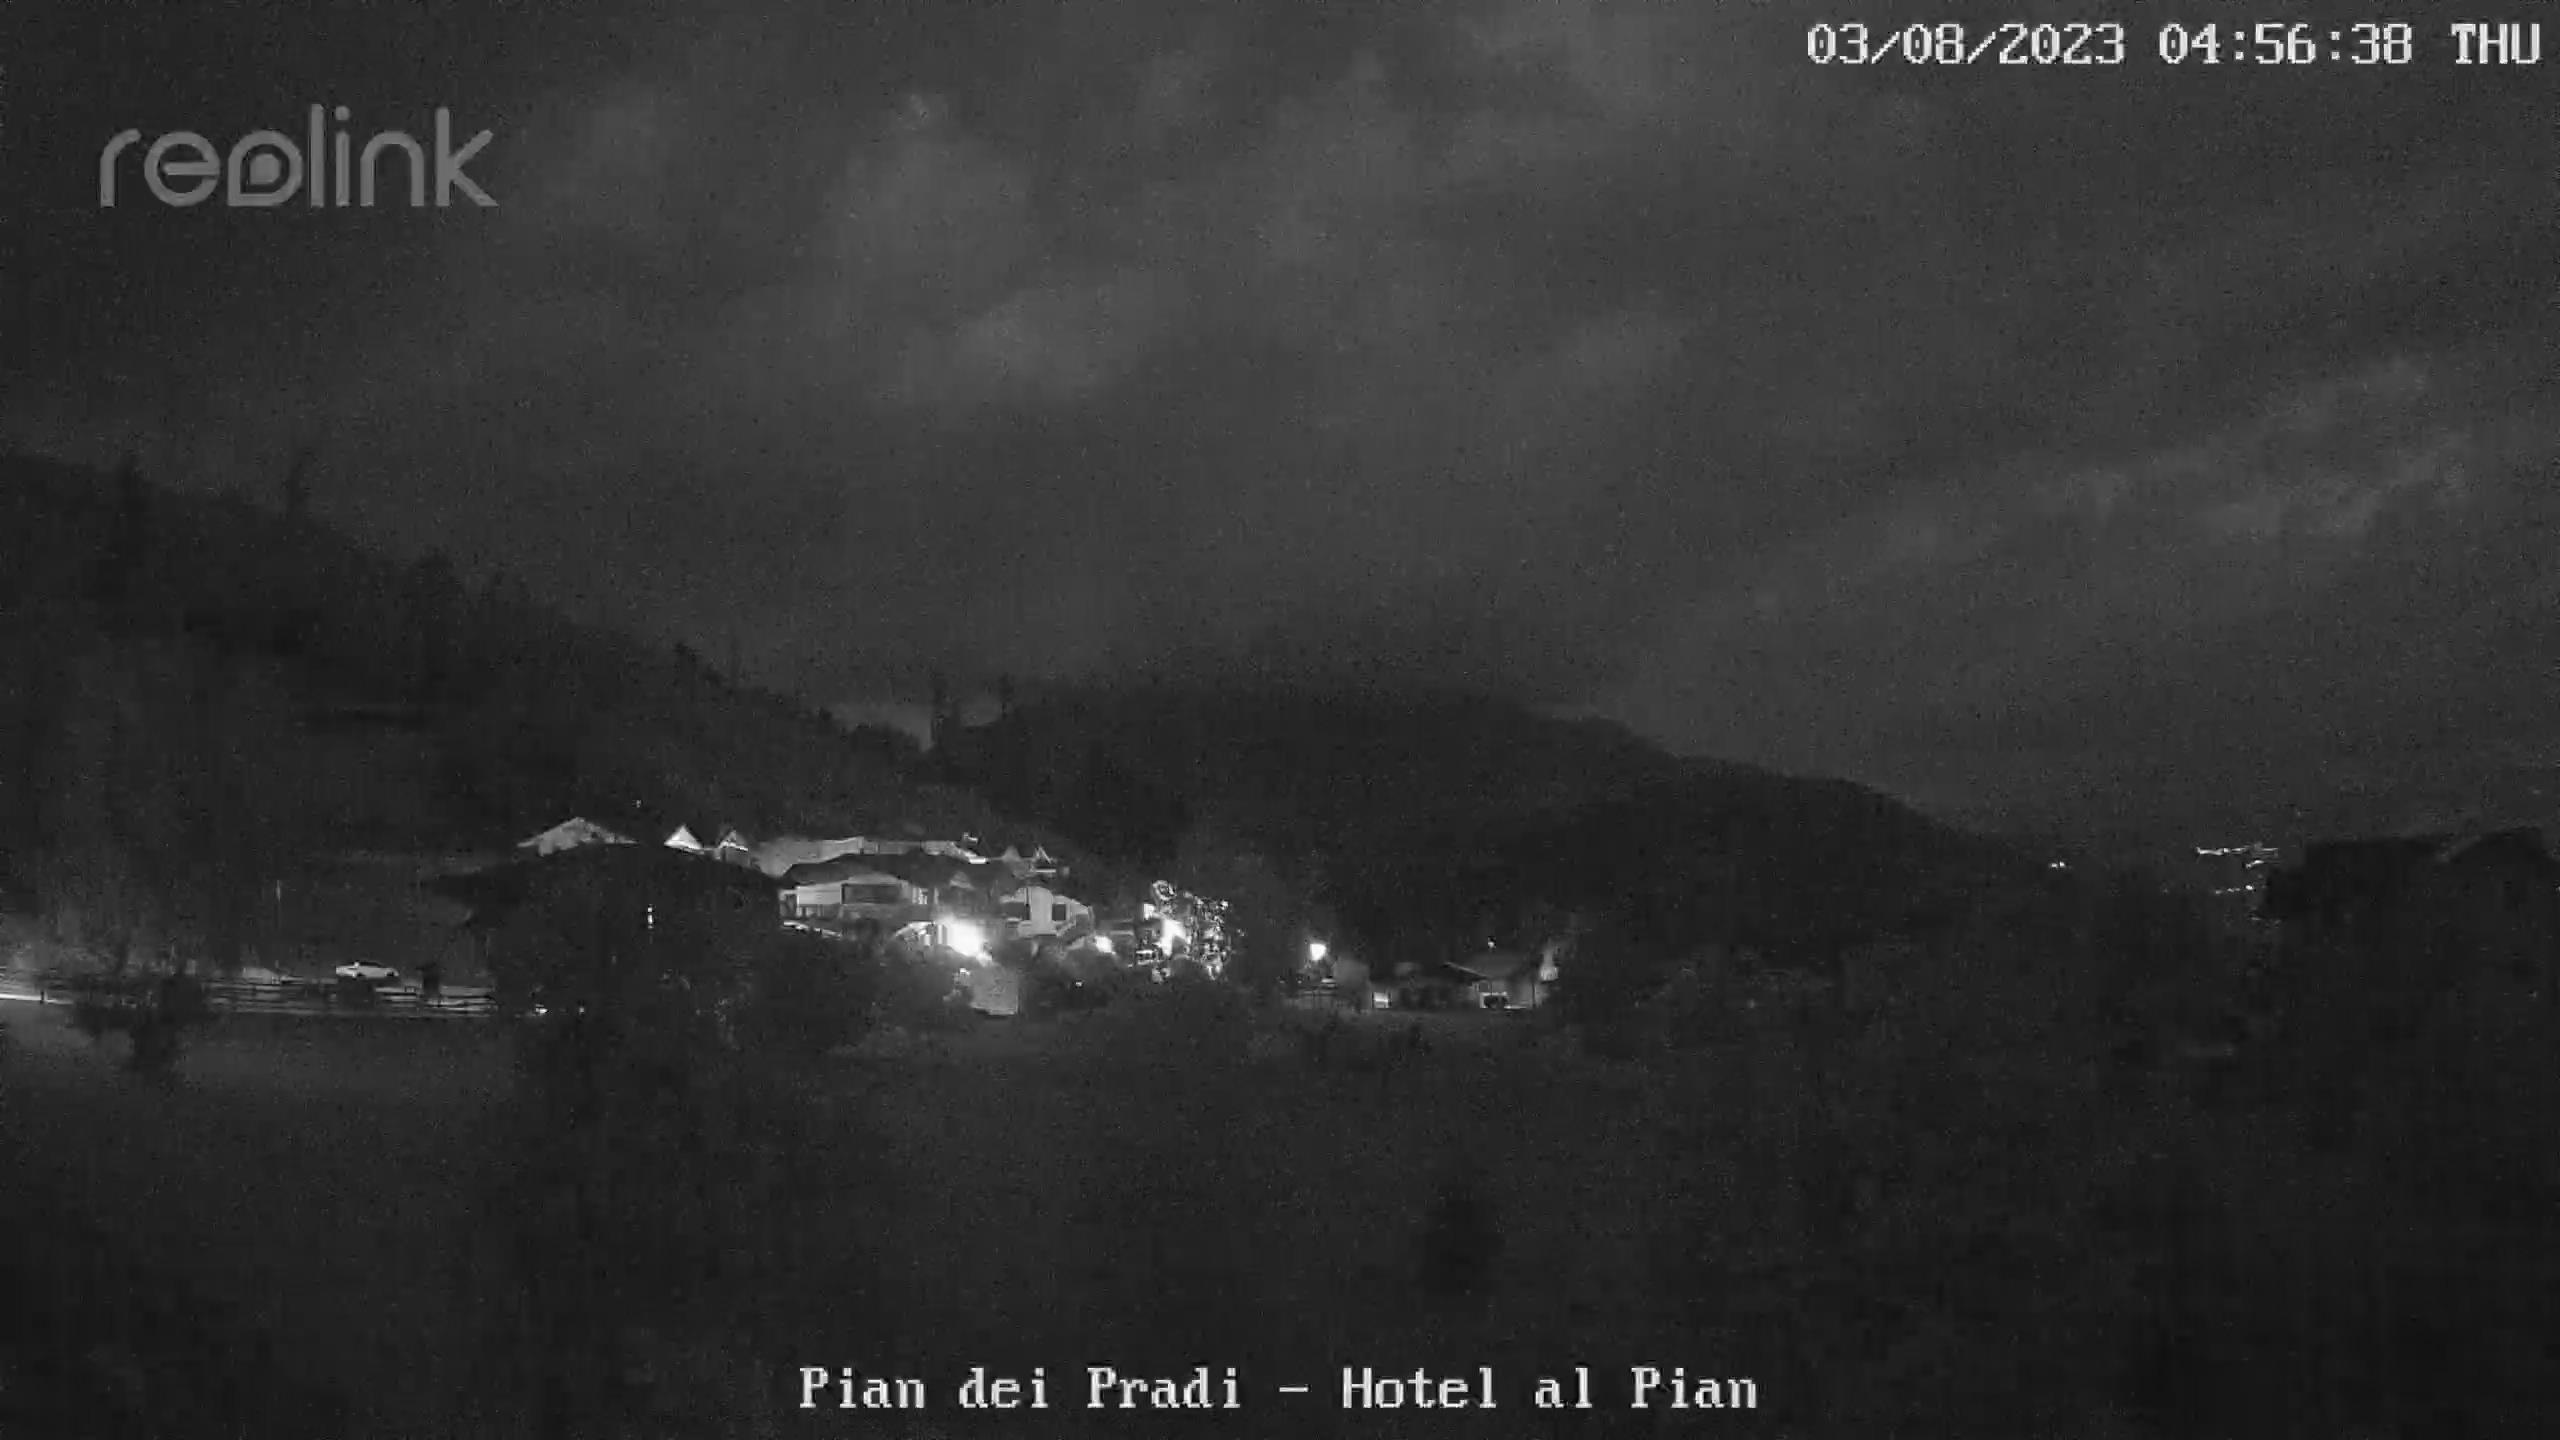 Webcam a cura di Meteo Al Pian. Puntamento verso la Vigolana